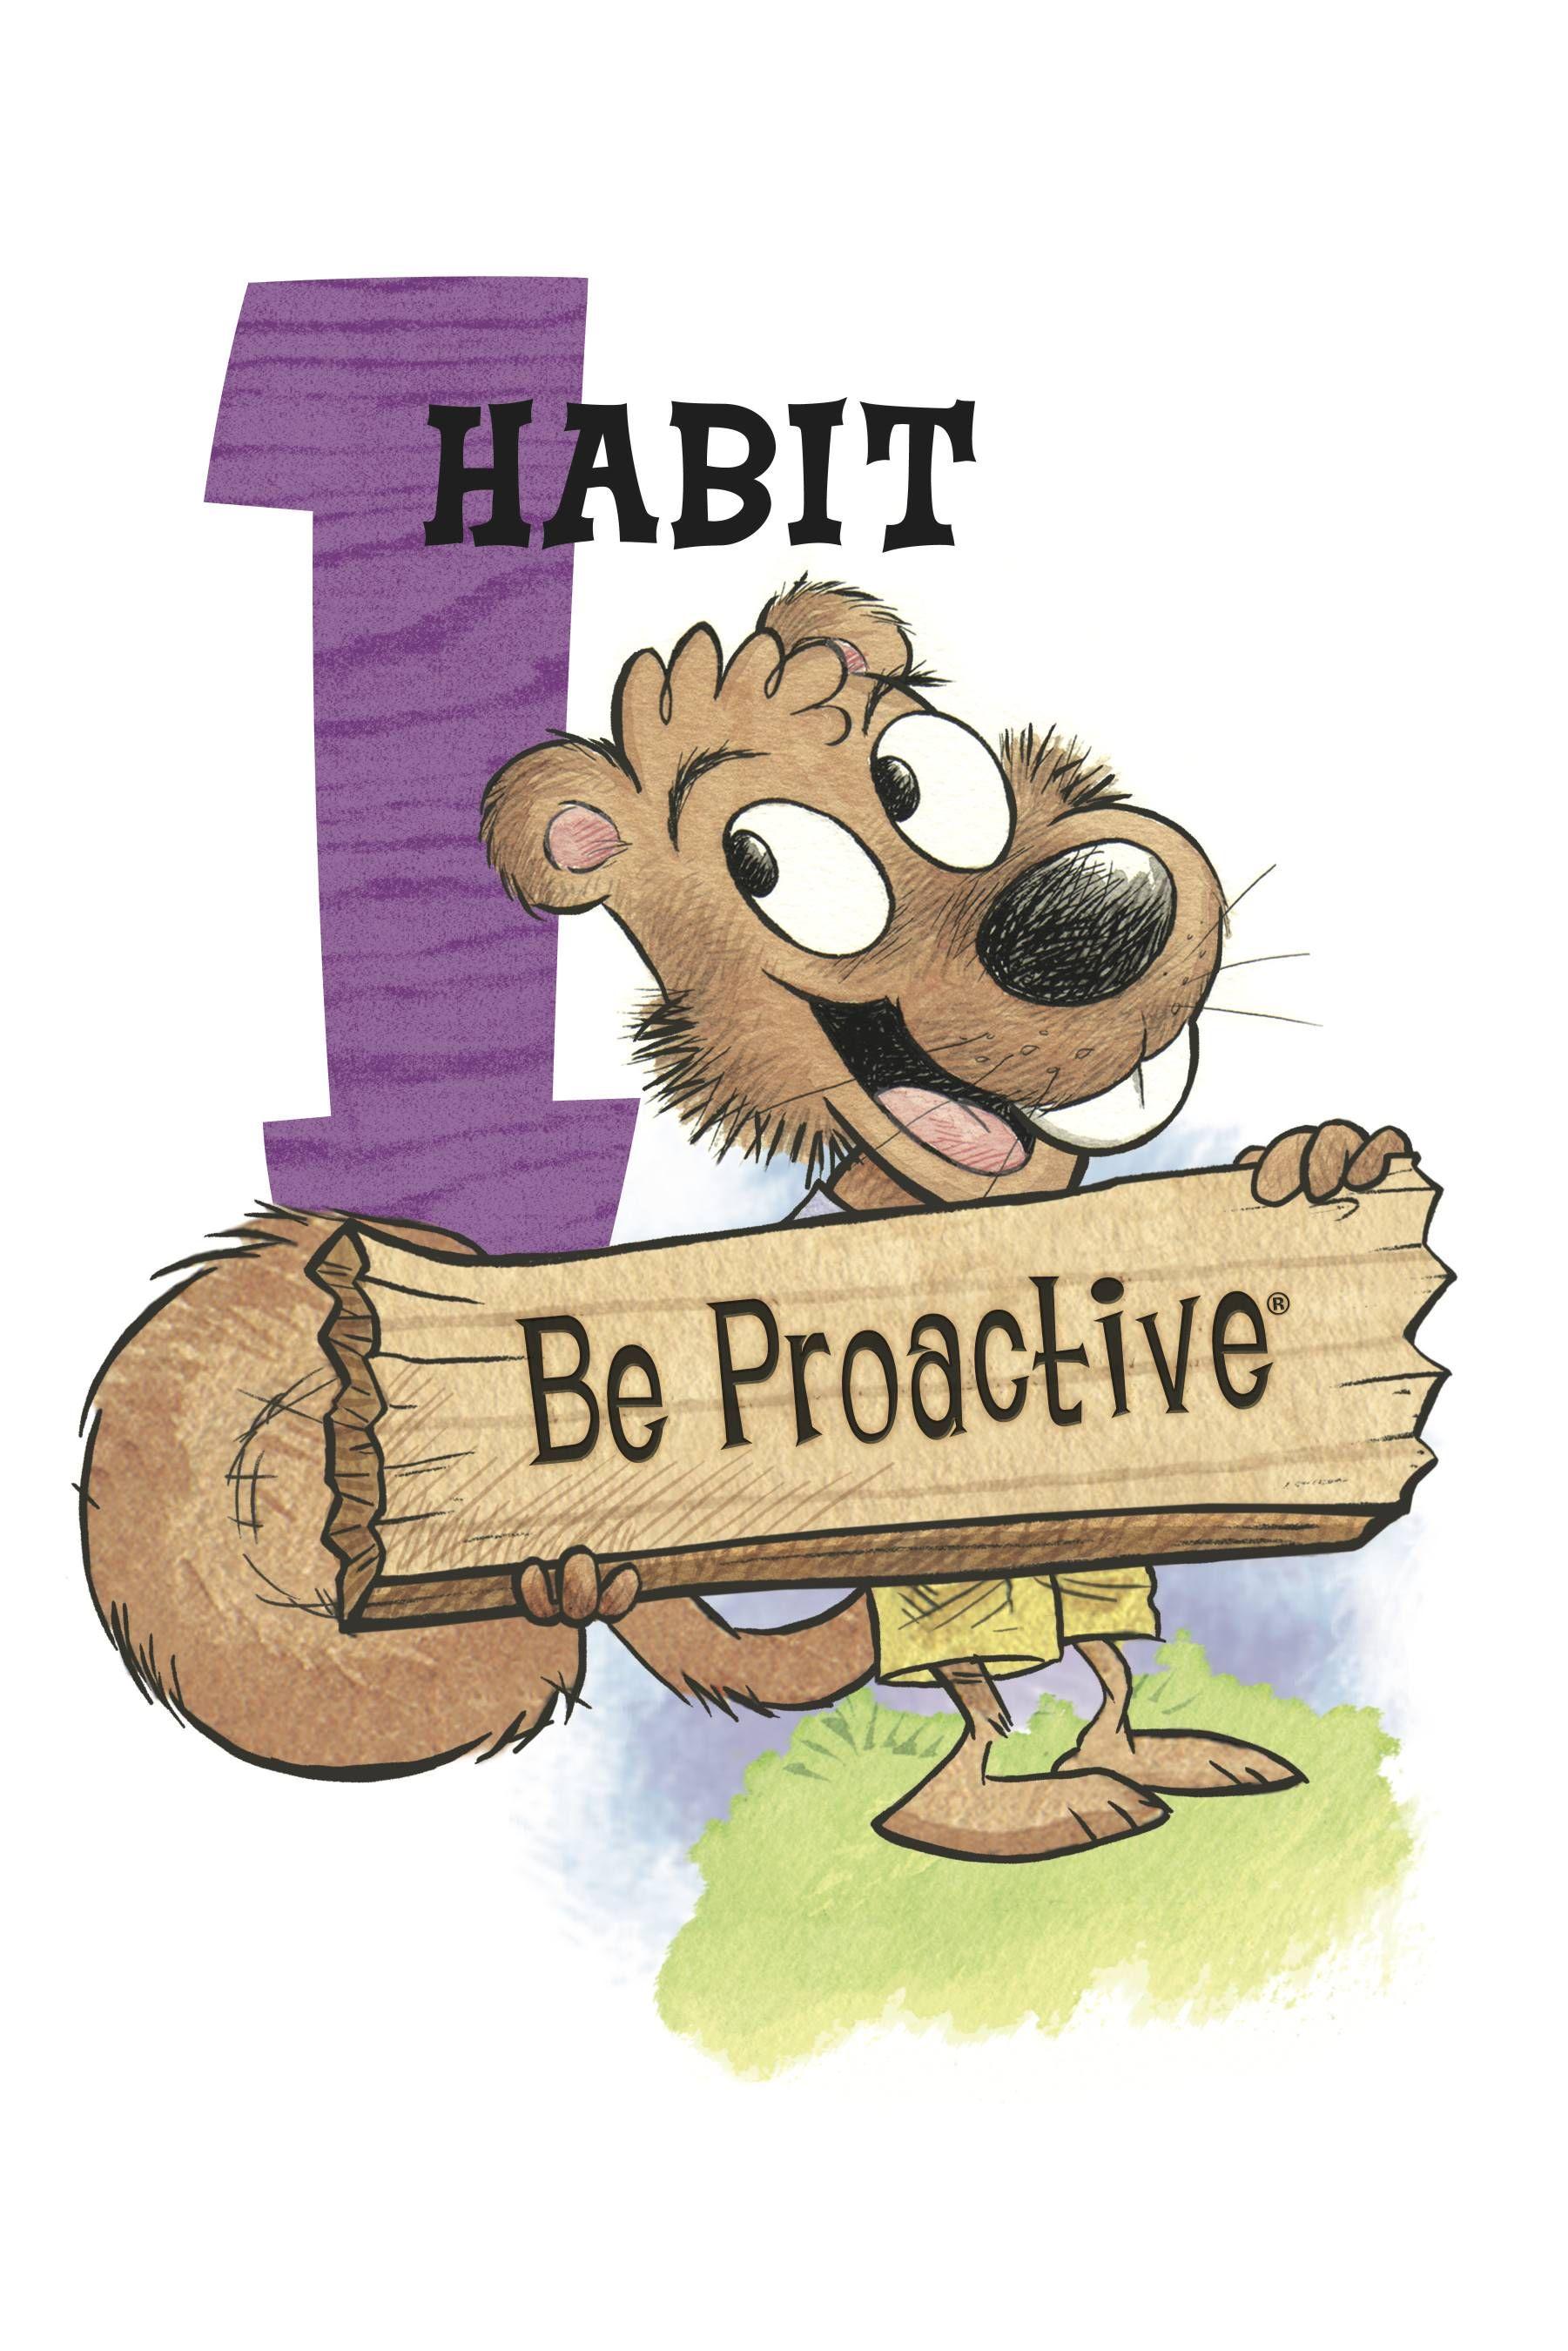 Habit 1 Be Proactive